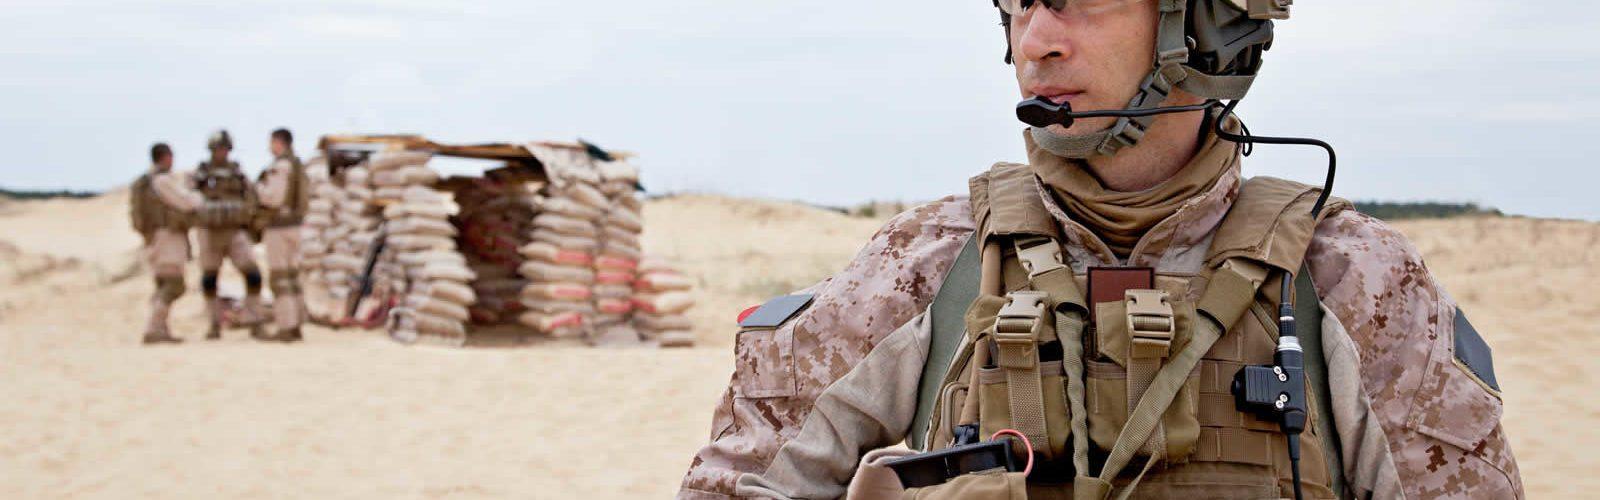 us-army-armee-terre-americaine-protection-defense-etats-unis-2